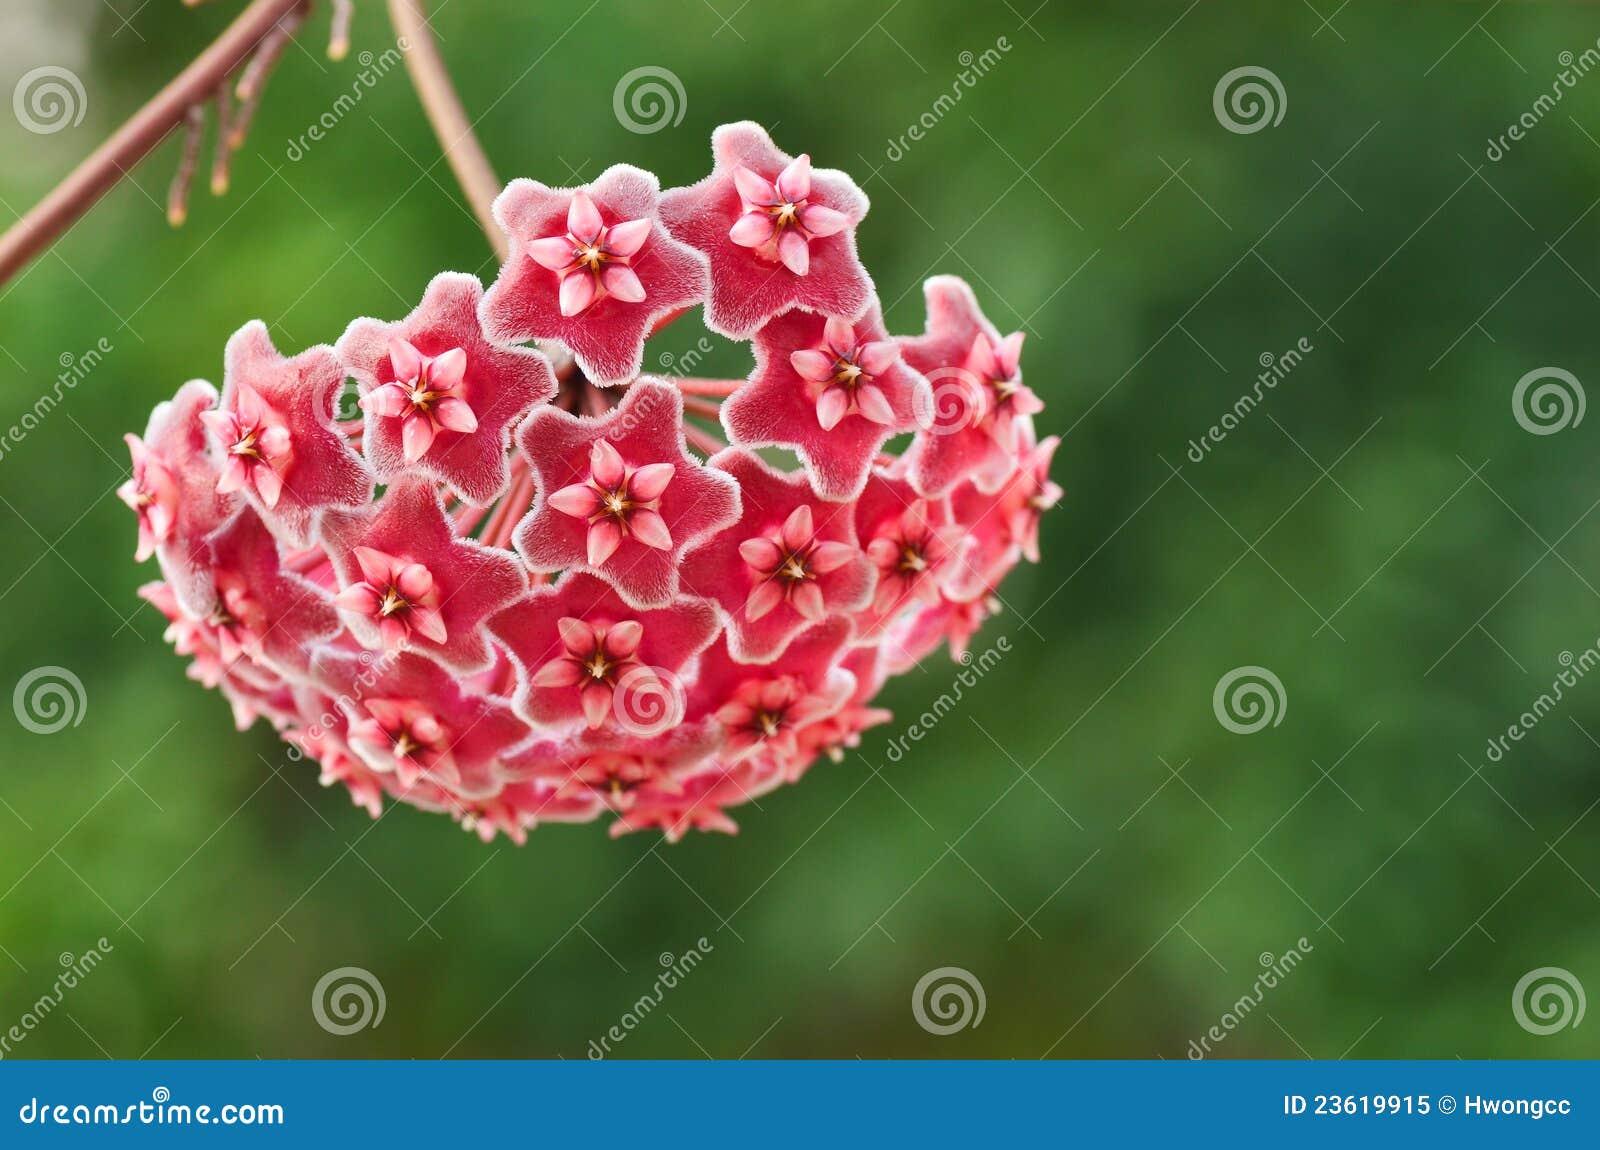 Wax plant (Hoya Pubicalyx)